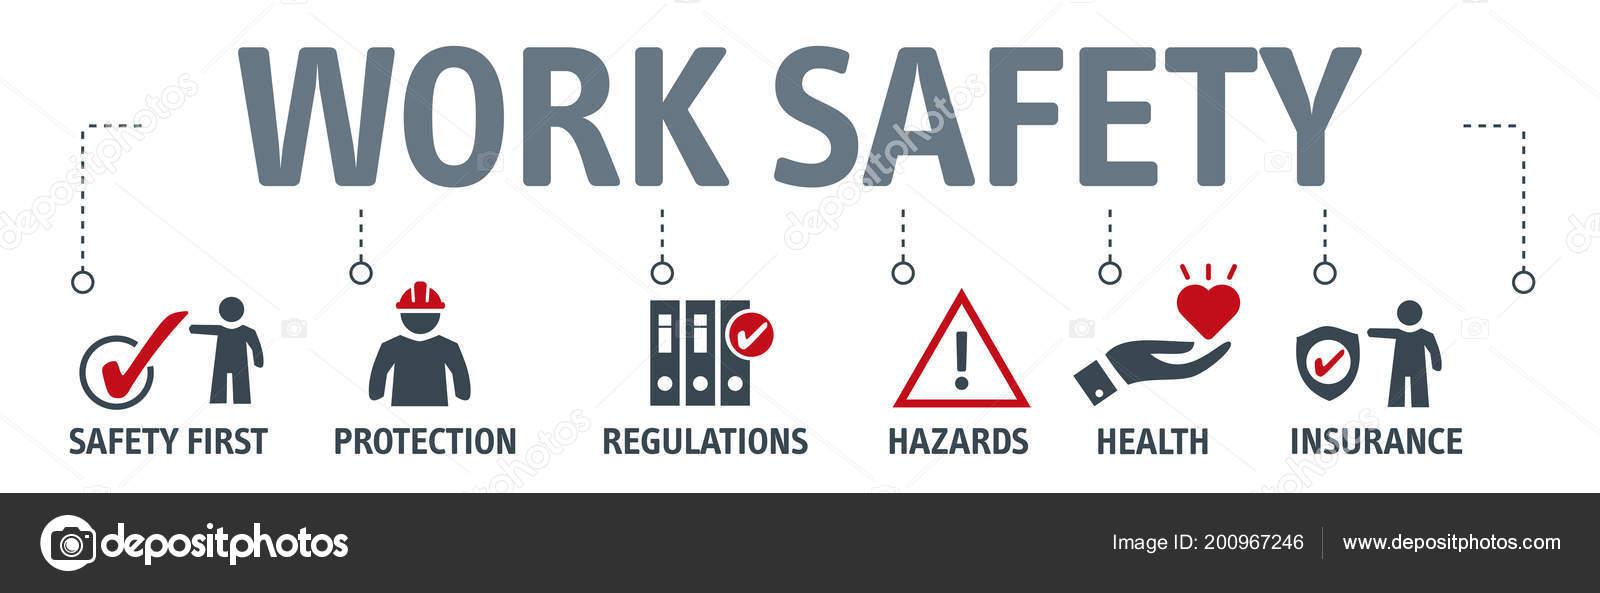 Banner Work Safety Concept Hazards Protections Health Regulations Keywords Icons Stock Vector C Trueffelpix 200967246